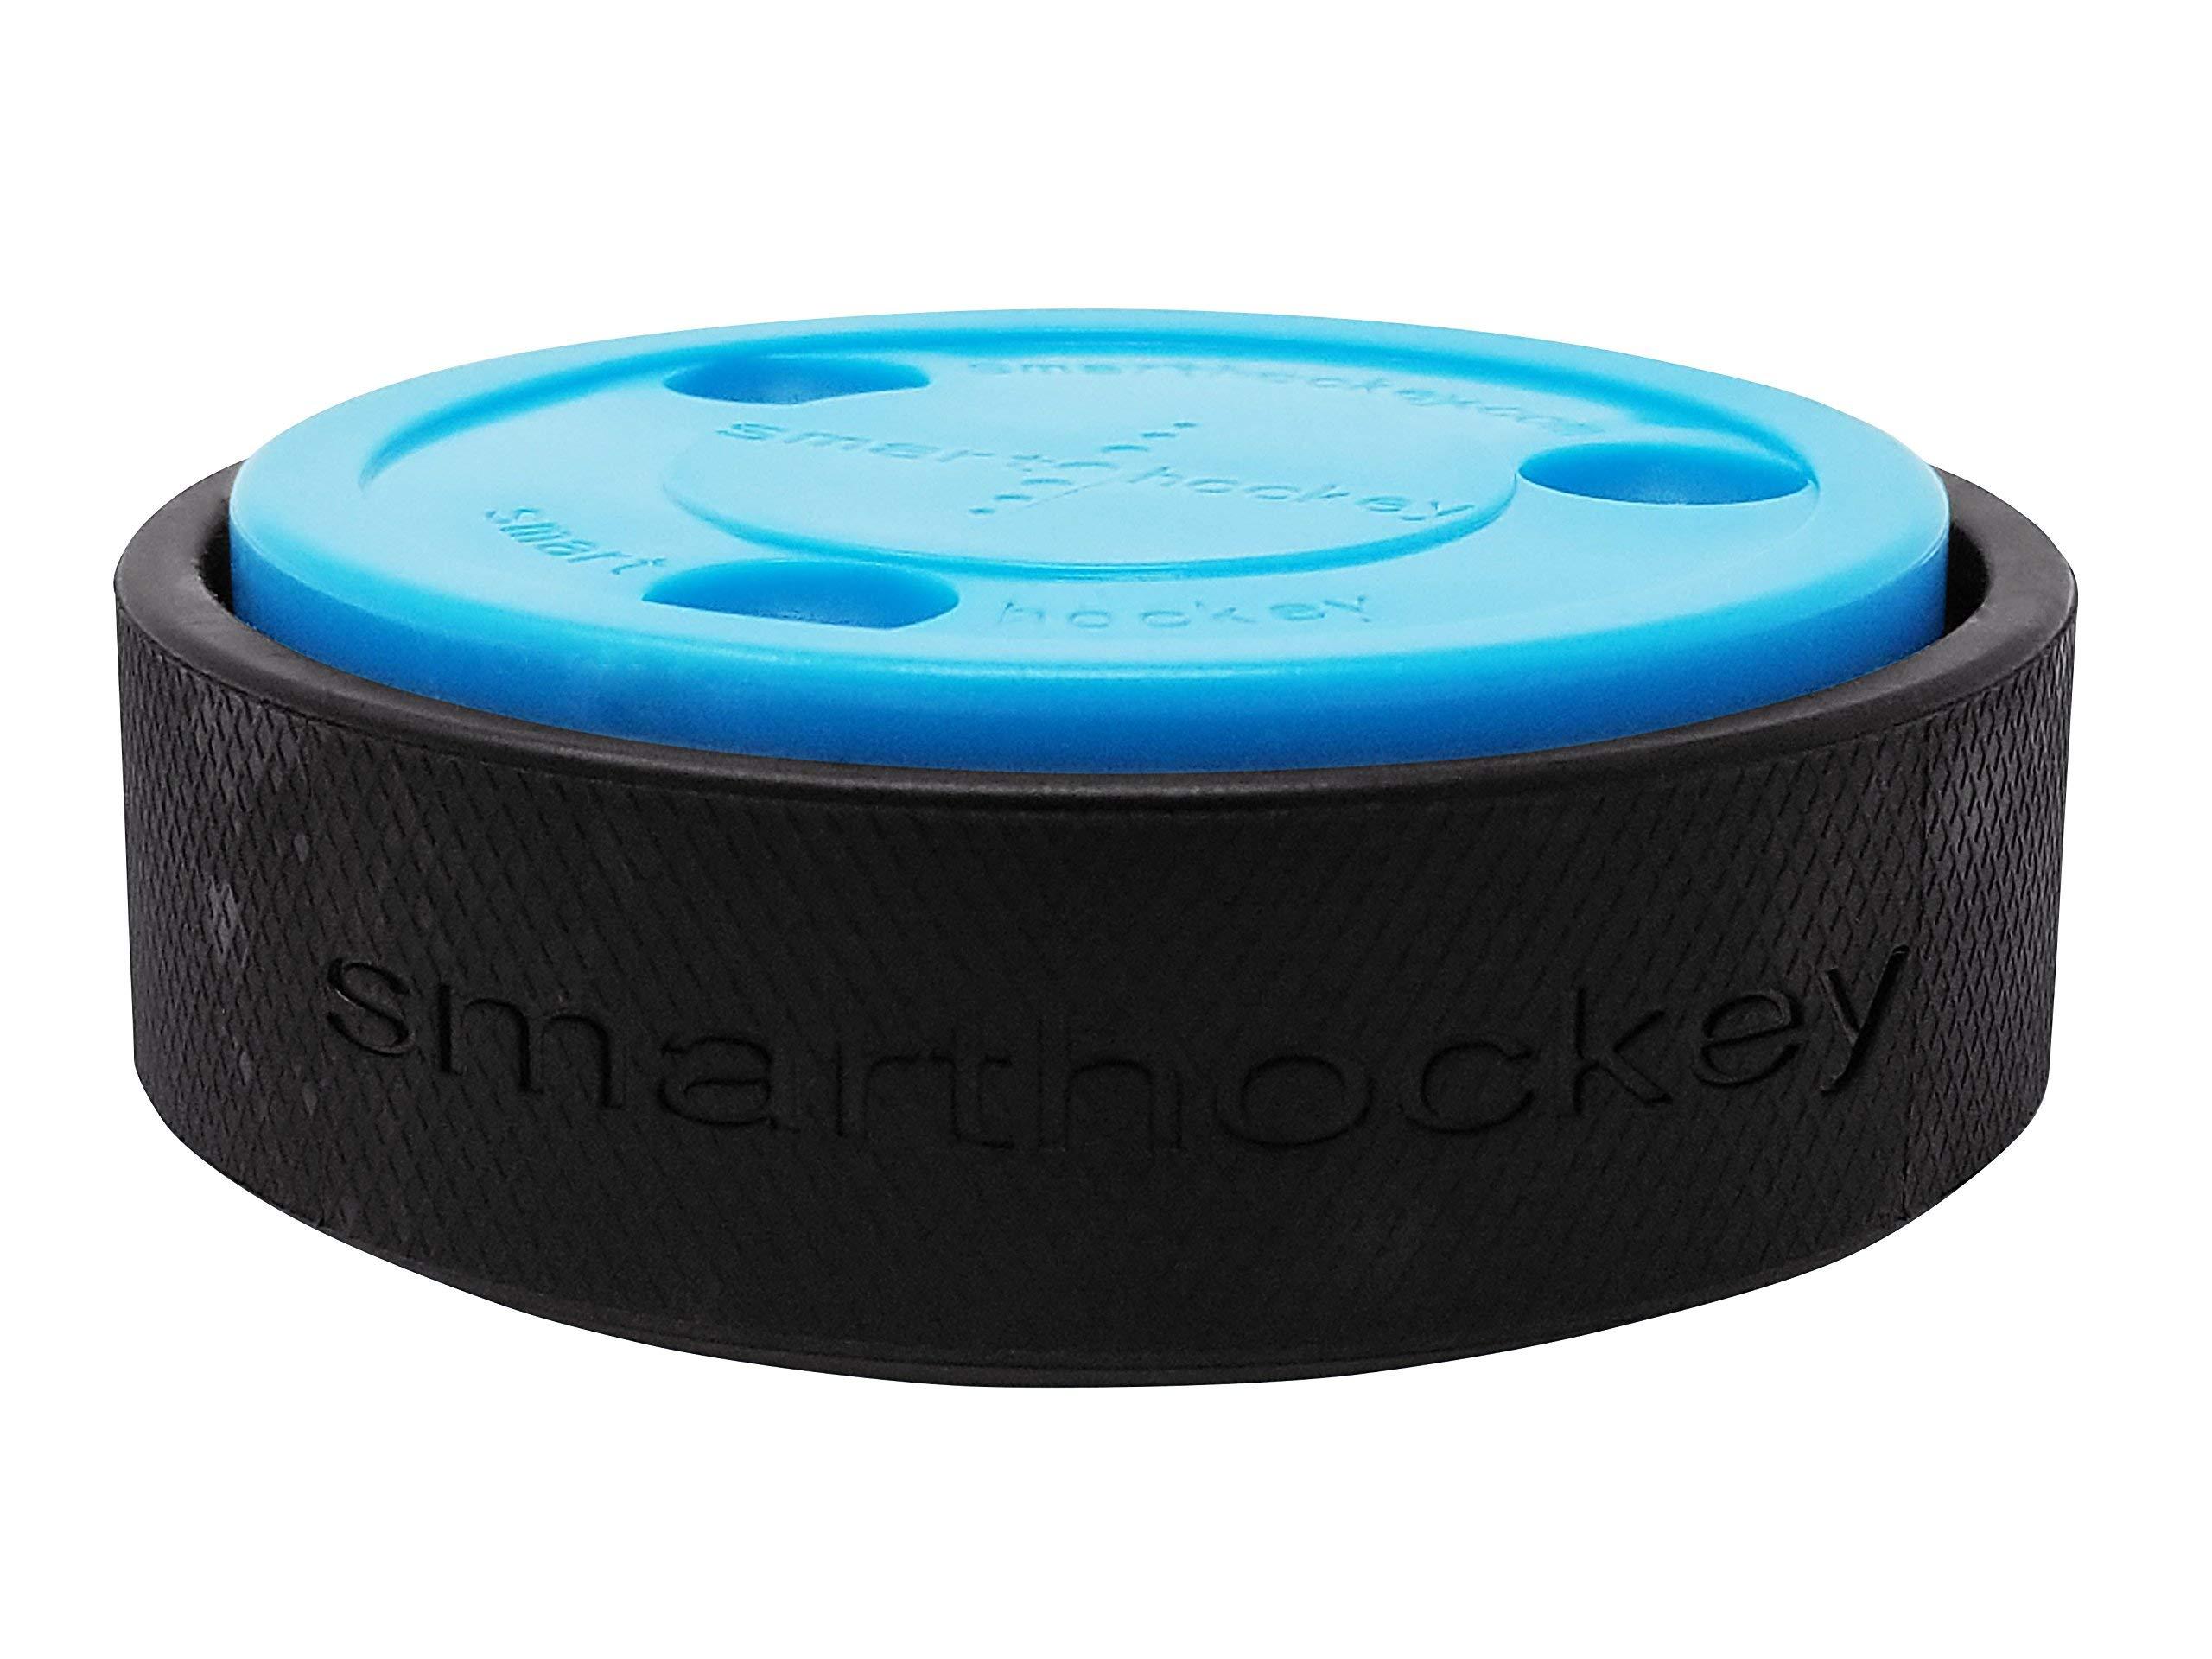 Smarthockey 4oz Slider Hockey Training Speed Puck - Blue 1-Pack